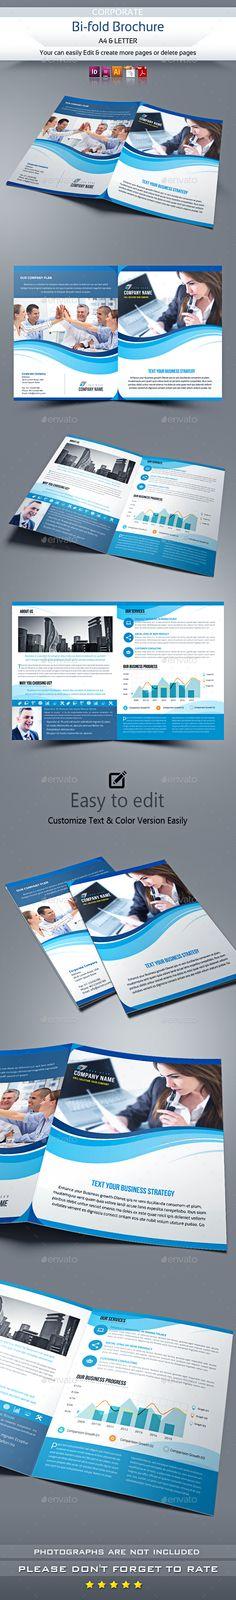 Company Bi-Fold Brochure Template Vector EPS, InDesign INDD, AI Illustrator